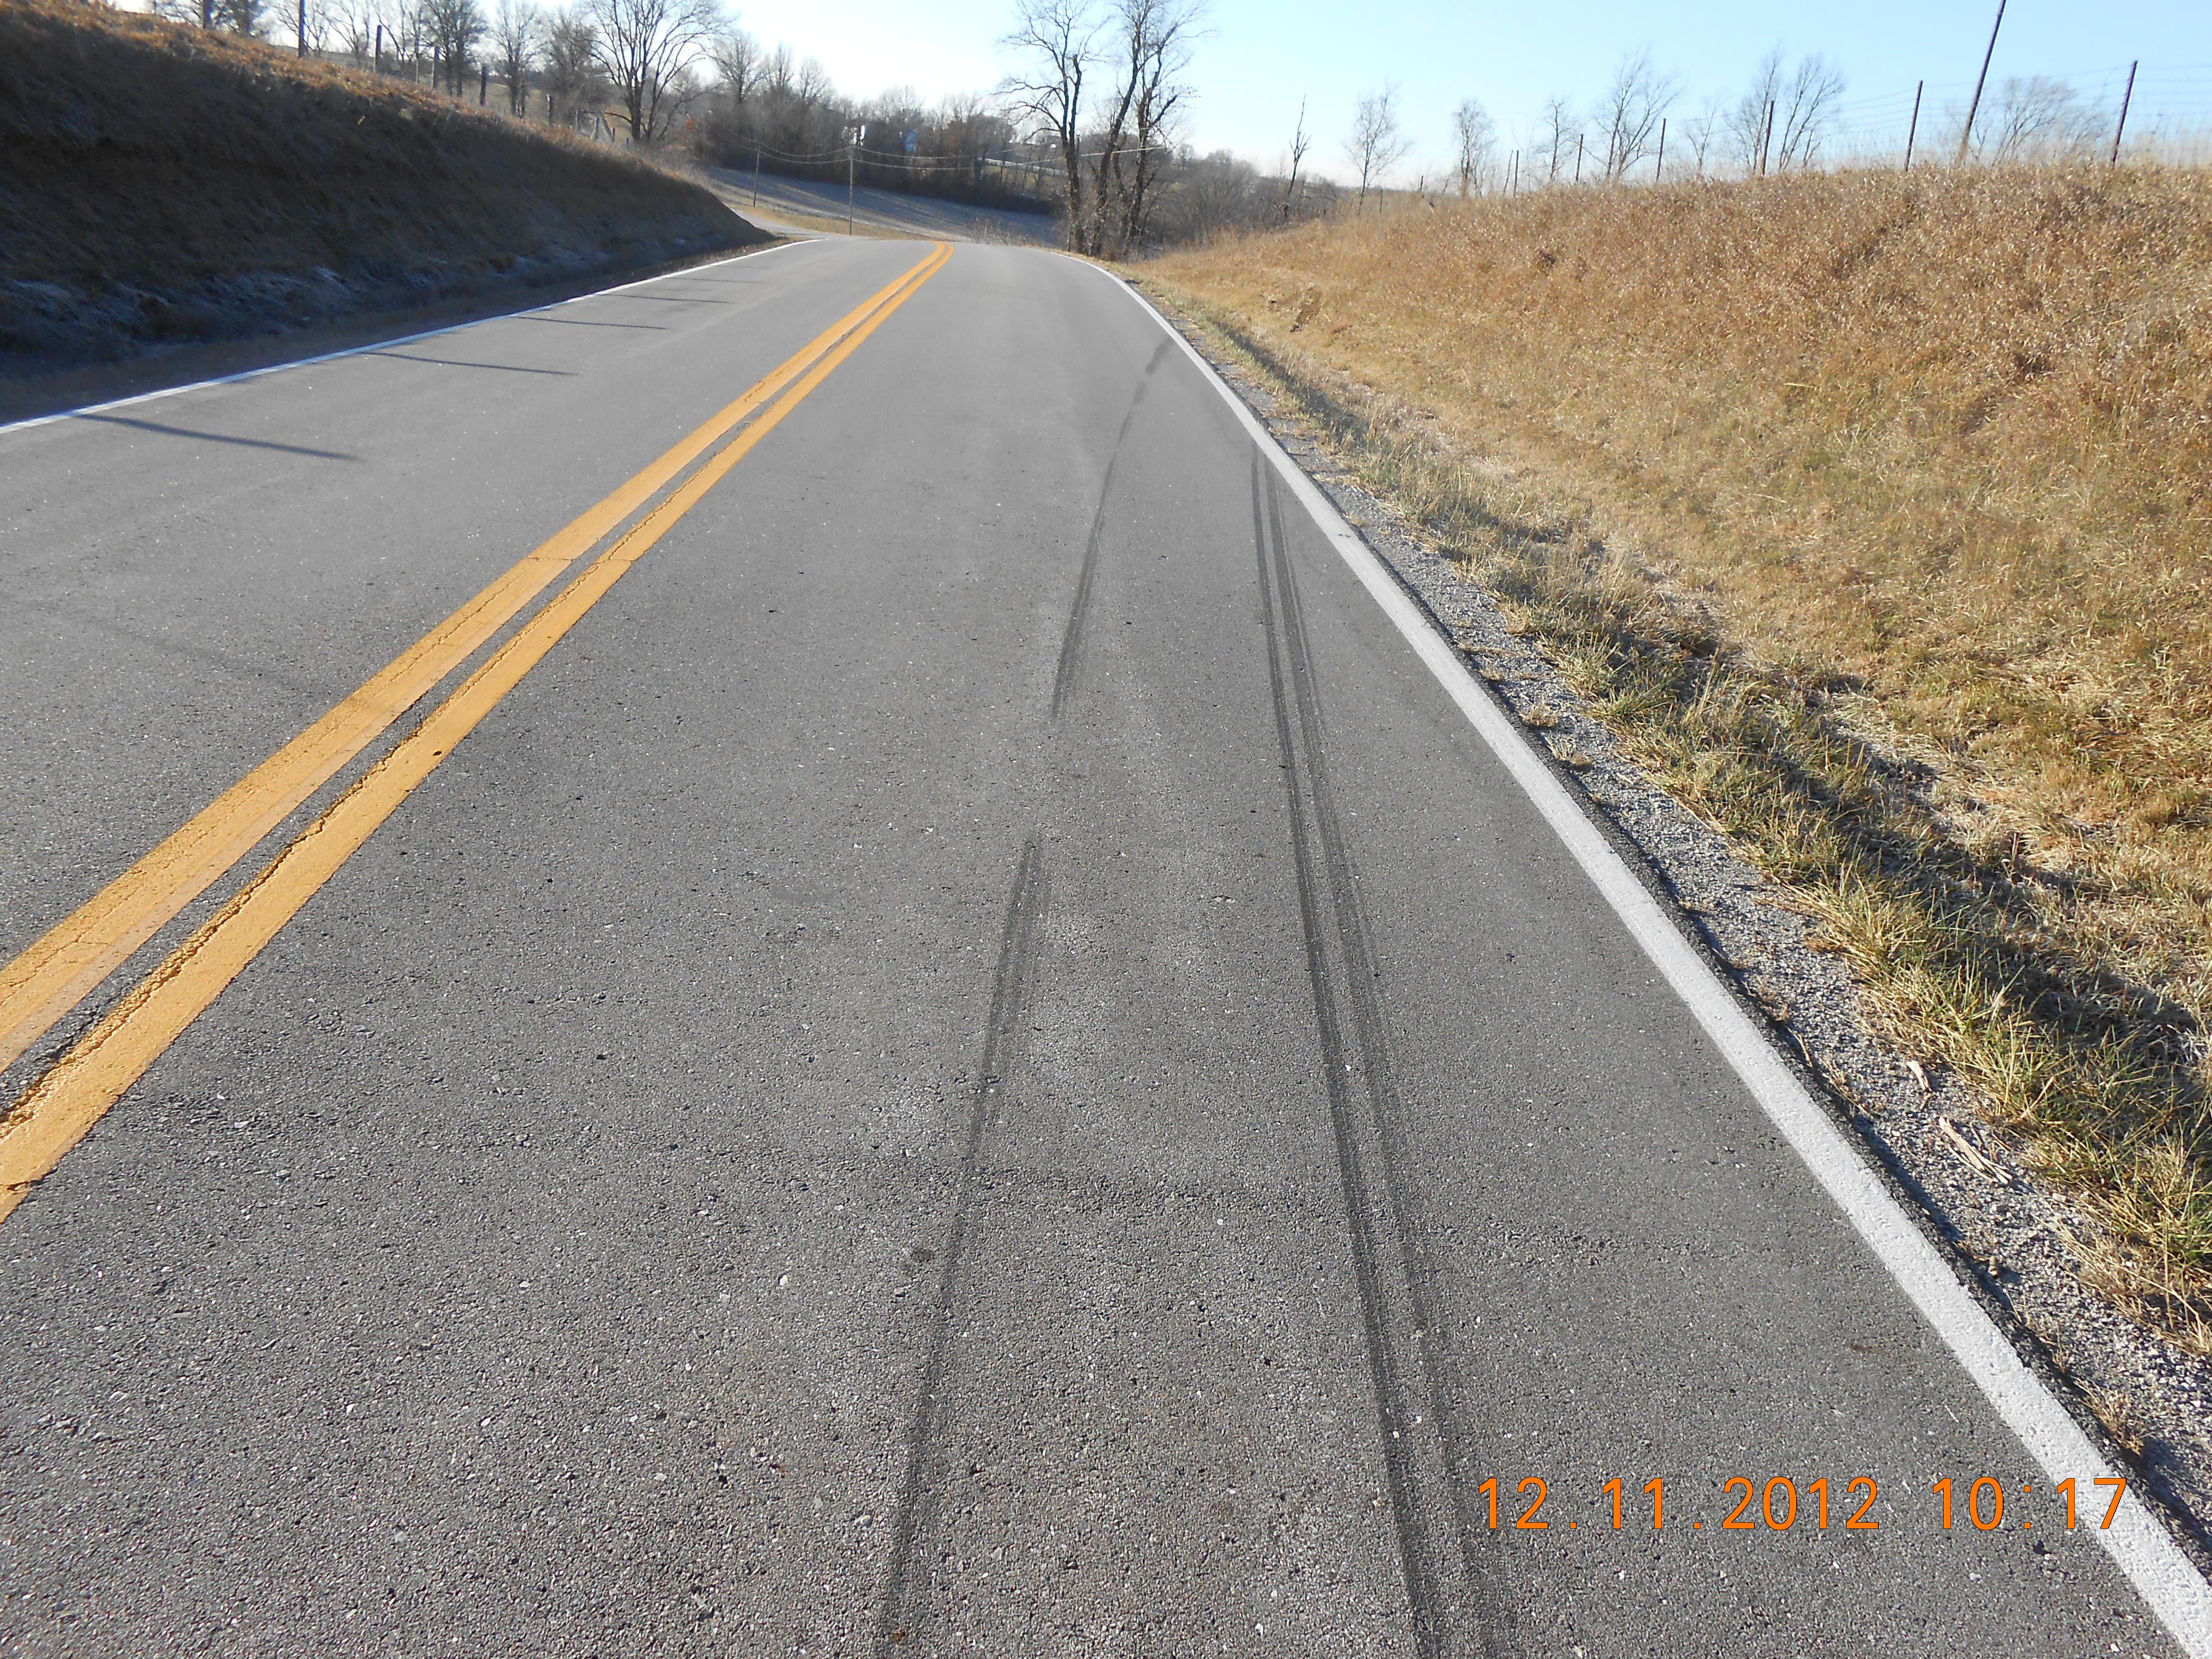 Rural Missouri vehicle accident scene